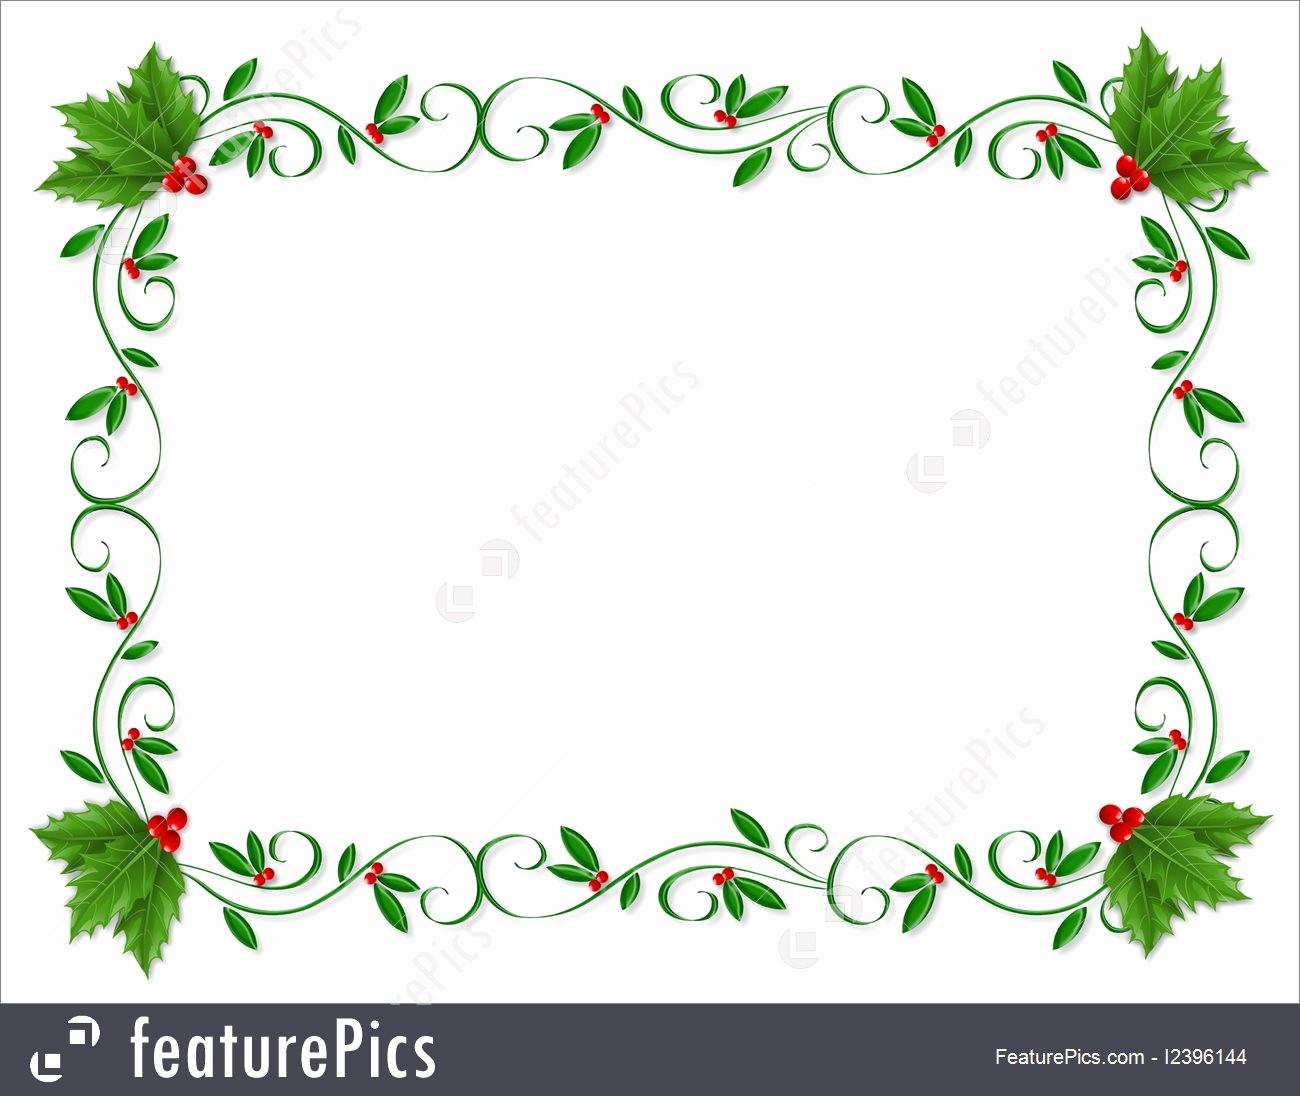 Festive Borders for Word Document Best Of Christmas Holly Border ornamental Illustration